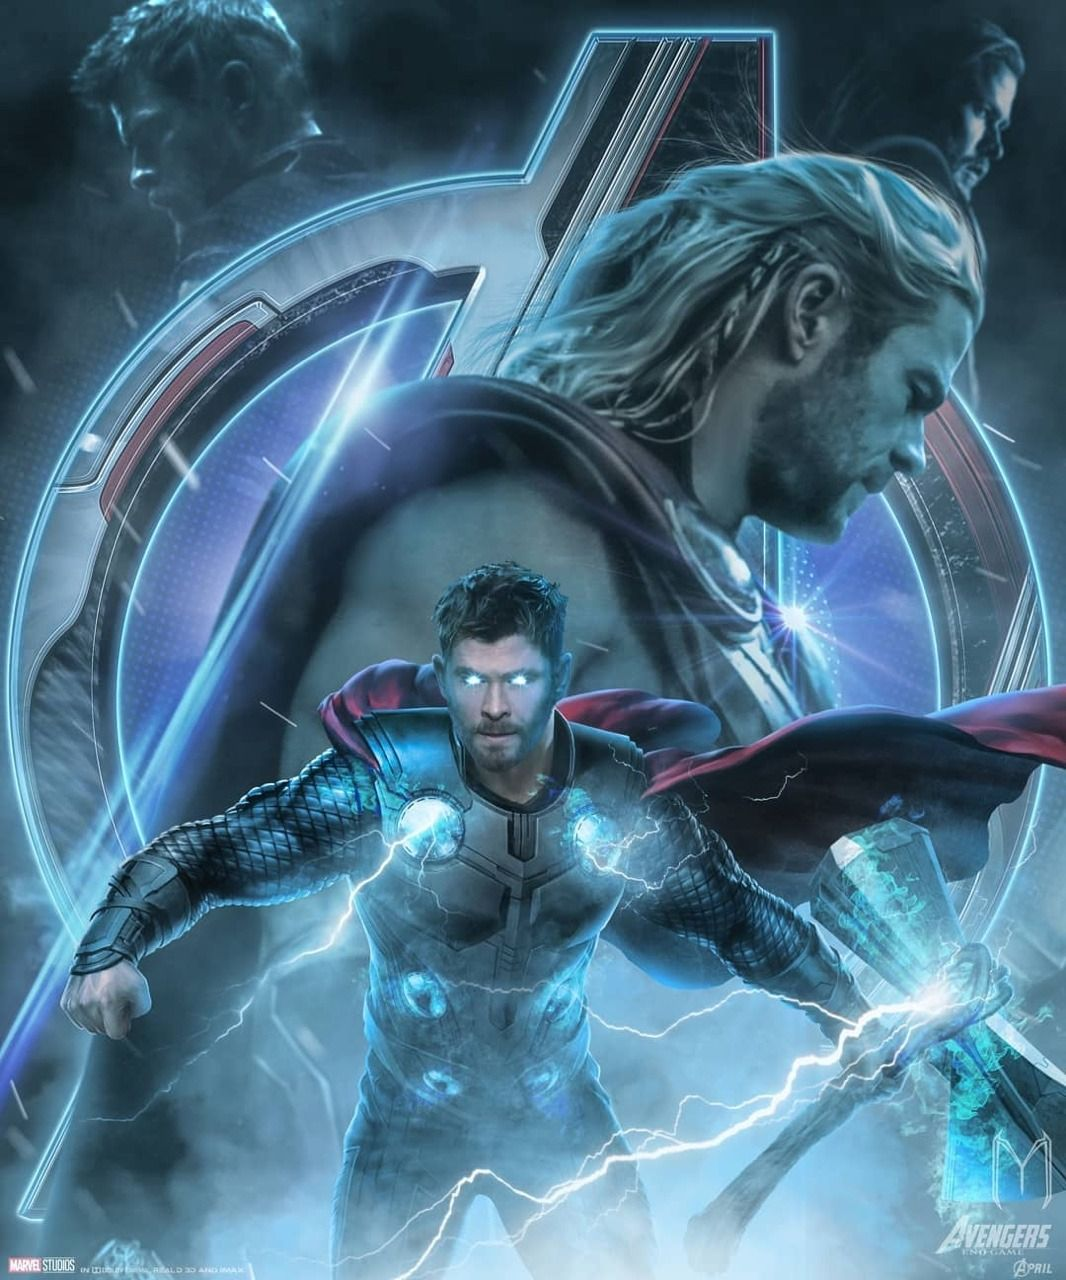 Top 10 Most Formidable Thor Villains From Mangog To Malekith Comics Mcu Marvel Avengers Loki Avengersendgam Marvel Thor Thor Villains Thor Wallpaper